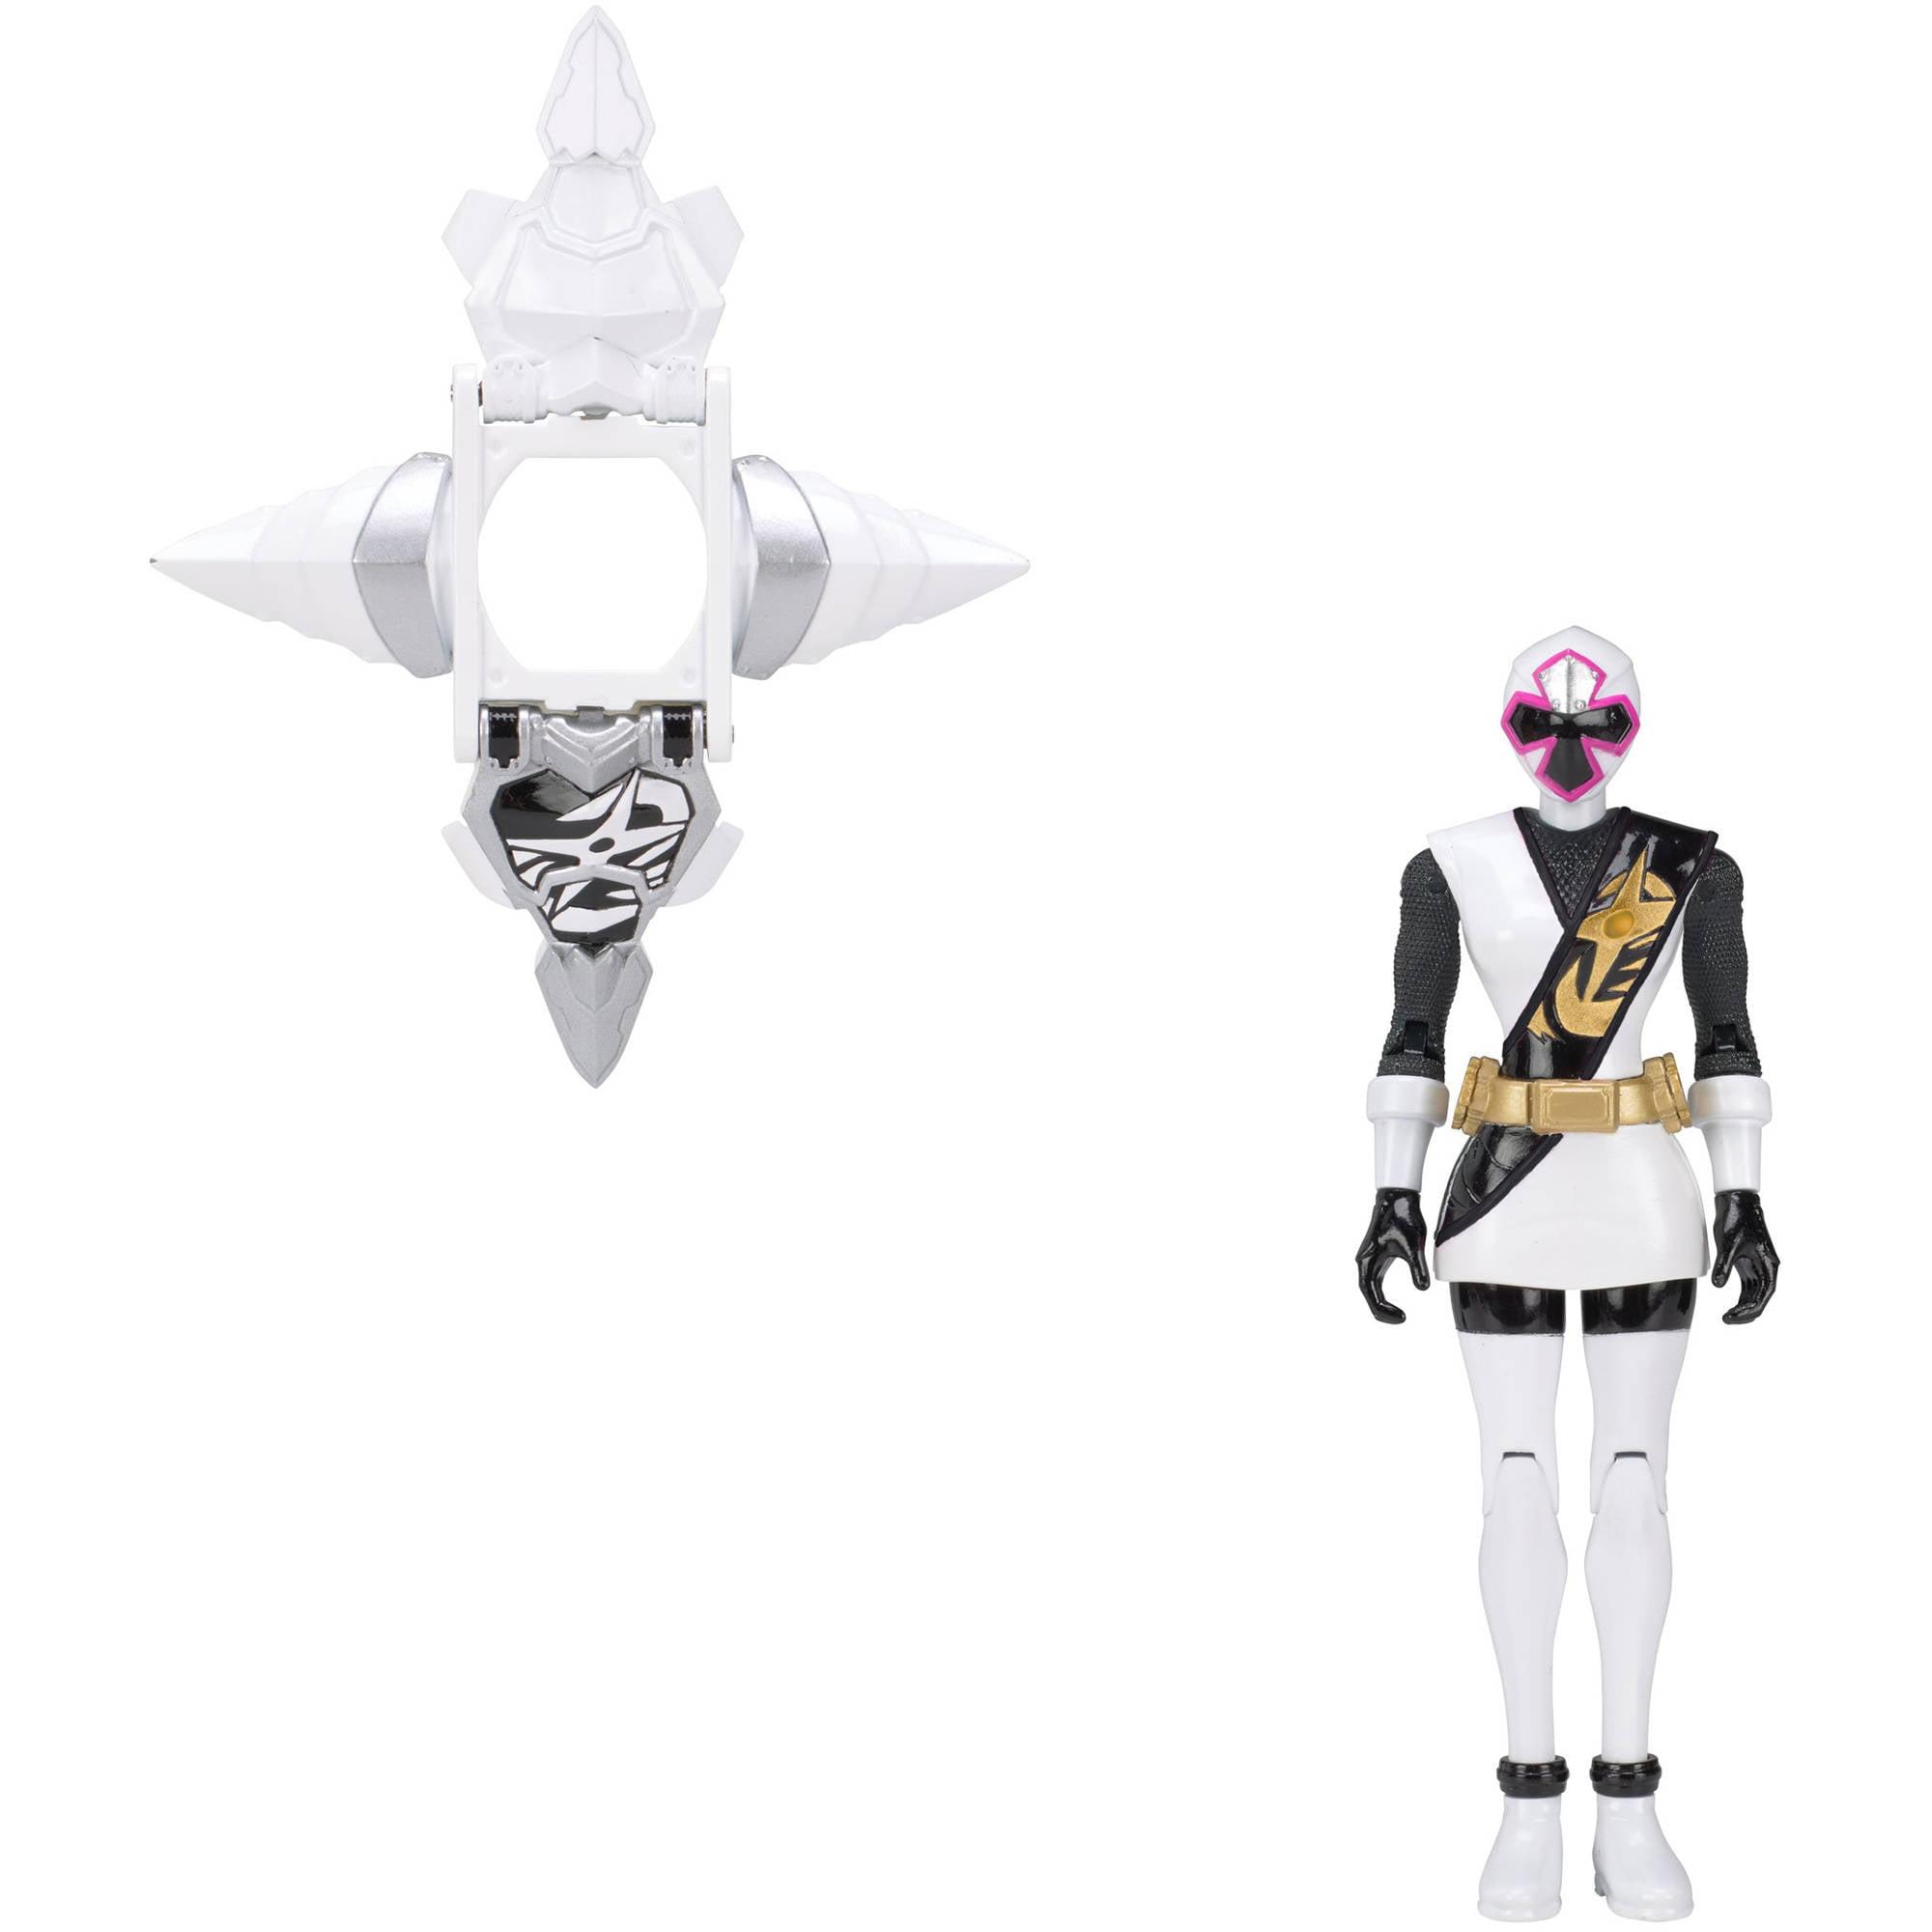 Power Rangers Ninja Steel Armored White Ranger by Bandai America, Inc